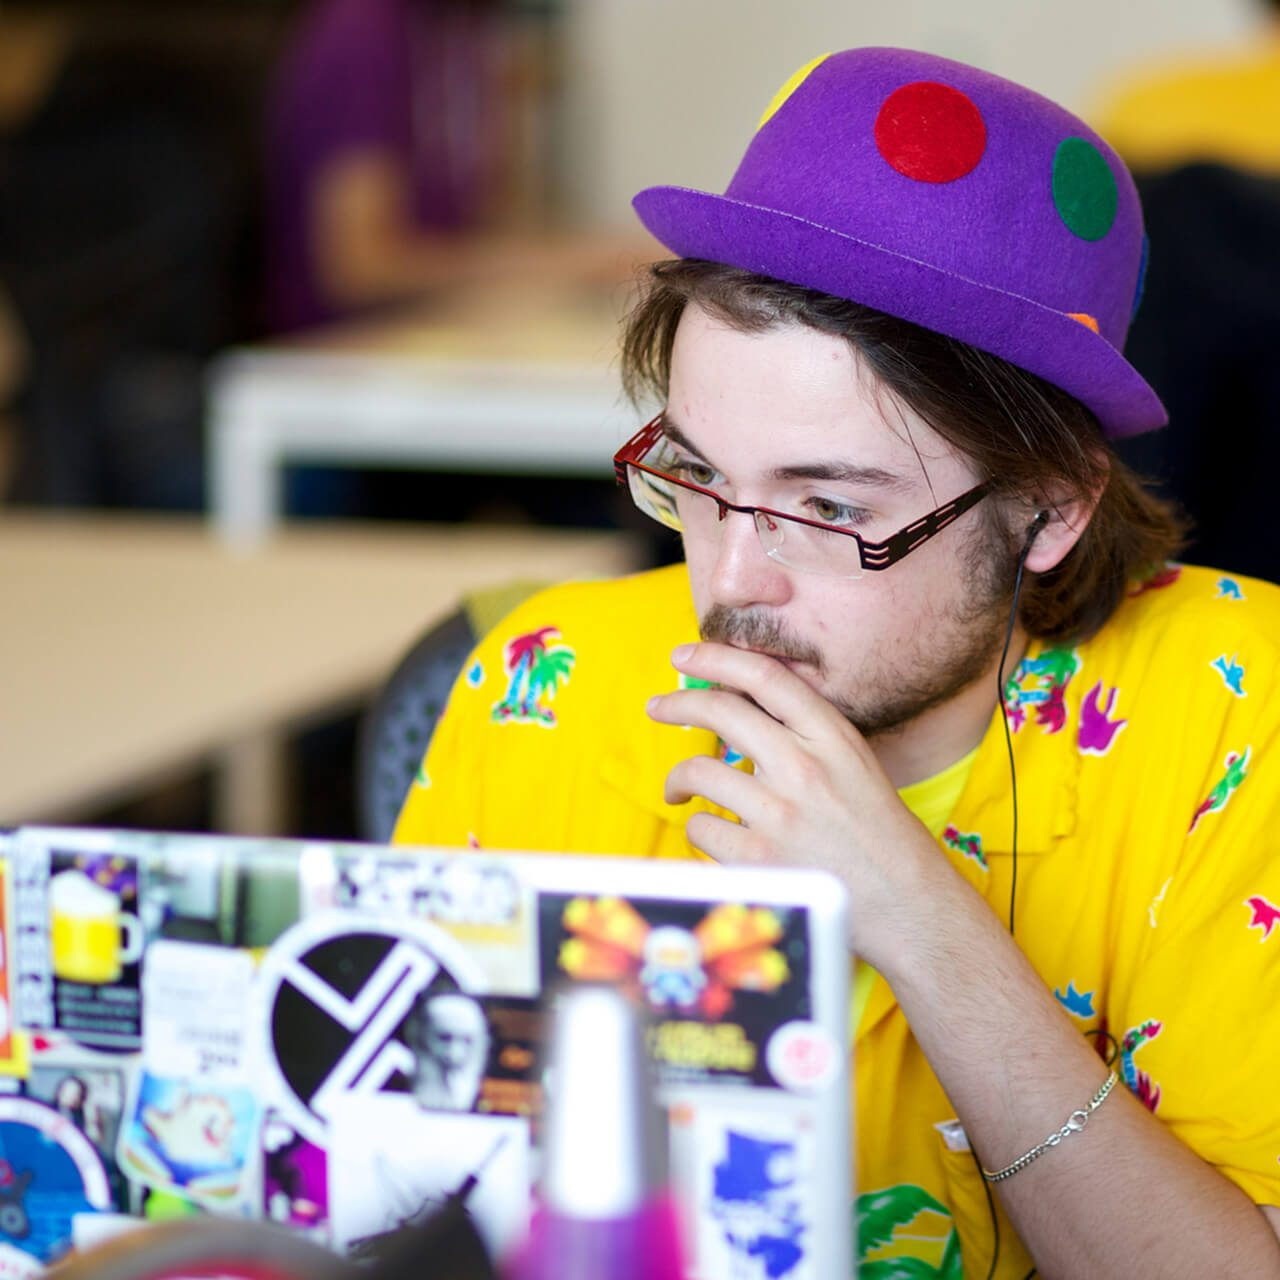 Creativity Beats Machines in a Digital Age